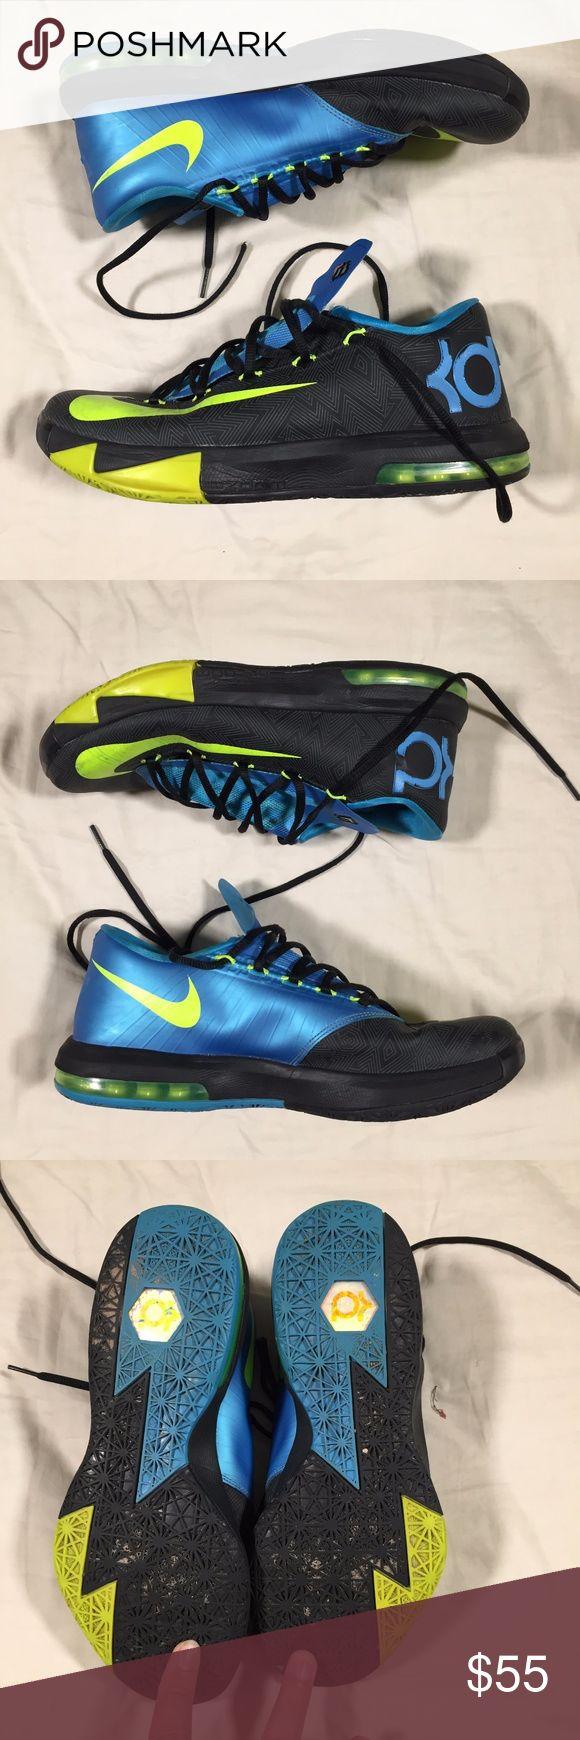 Nike KD VI Black Volt Vivid Blue - 599424 010 8.5 Nike KD VI Black Volt Vivid Blue - 599424 010 - MEN 8.5 Good, pre-owned condition. Please see all pictures Nike Shoes Sneakers